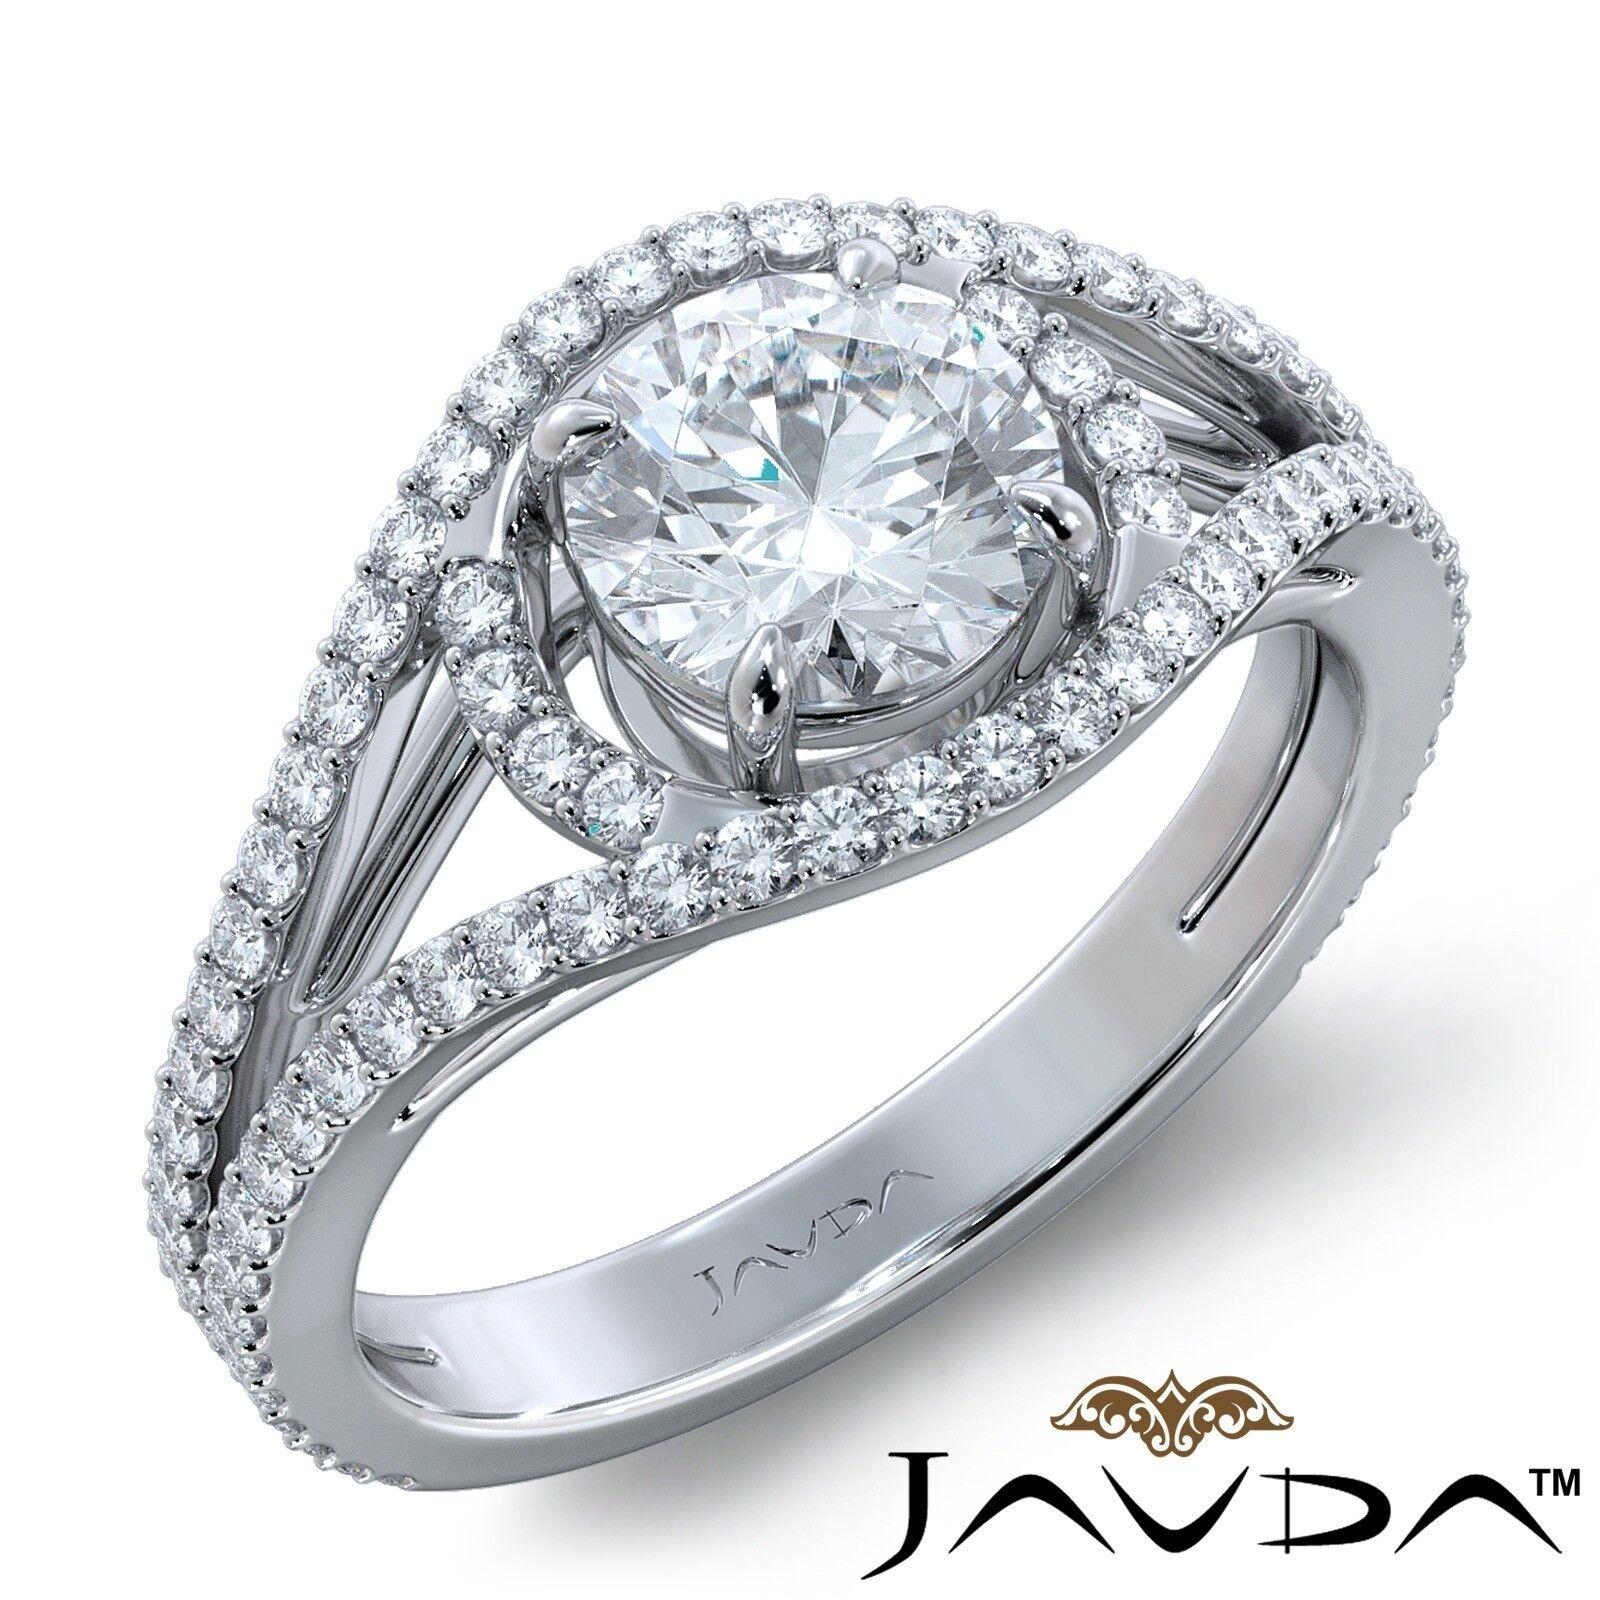 2.05ctw Halo Classic Sidestone Round Diamond Engagement Ring GIA G-VVS1 W Gold